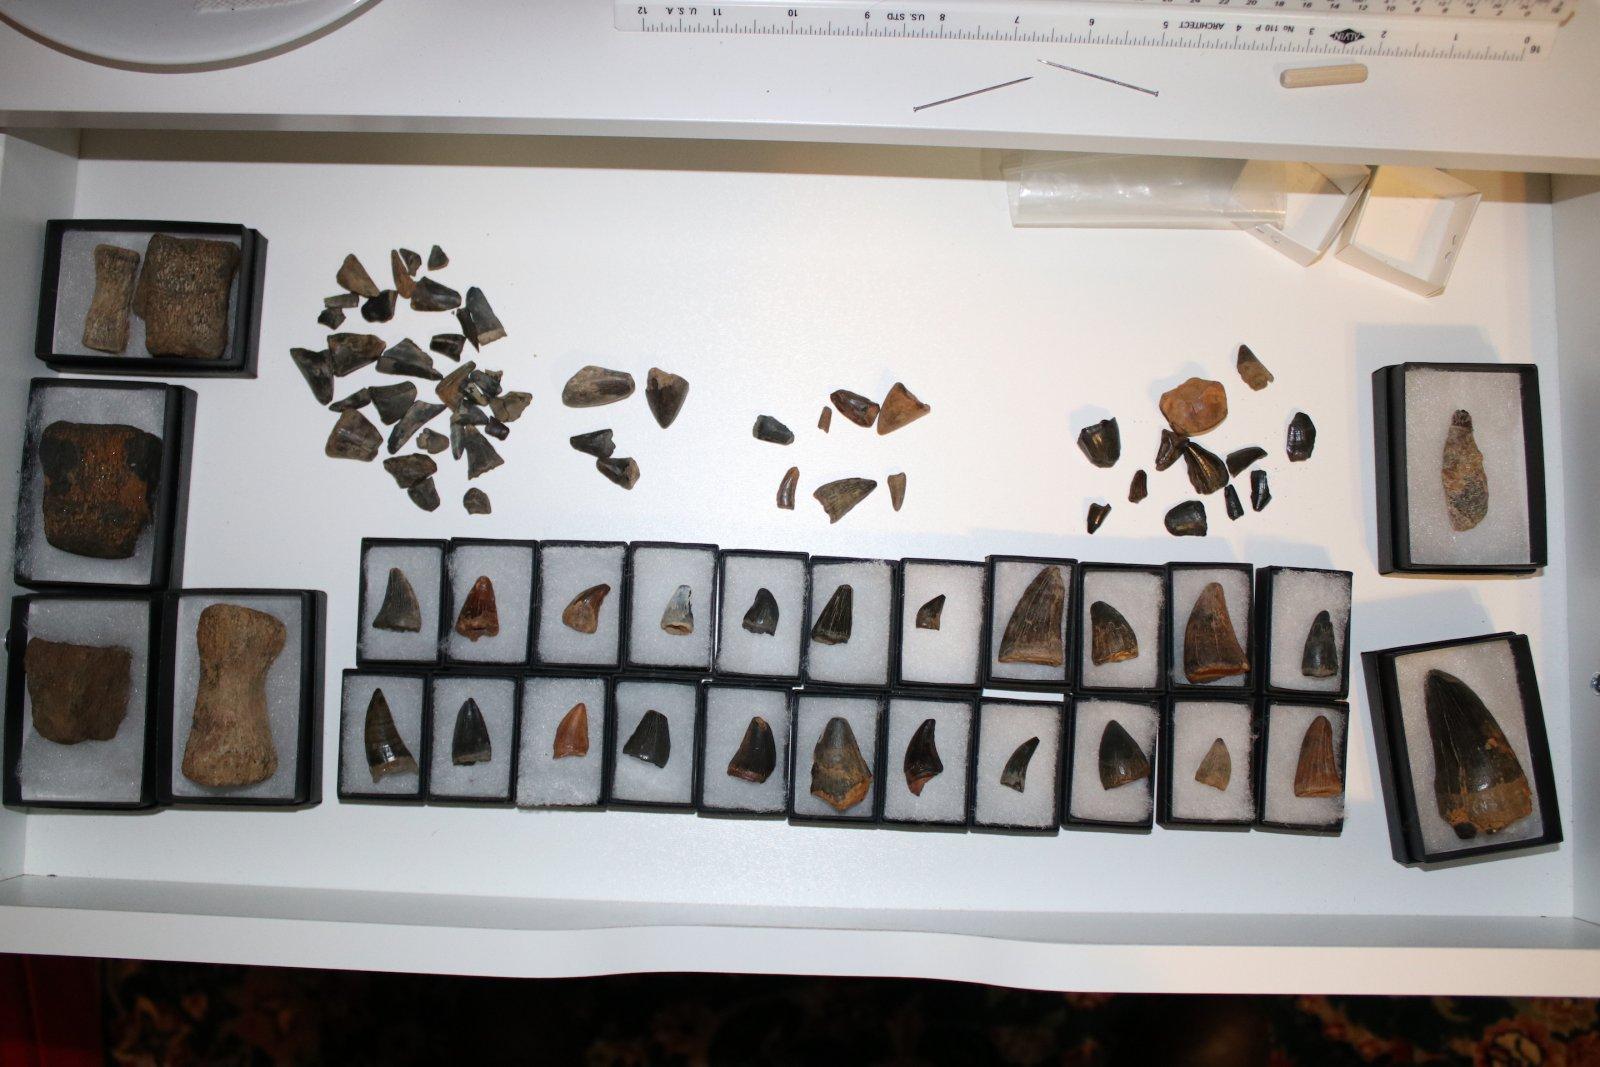 Mosasaur material